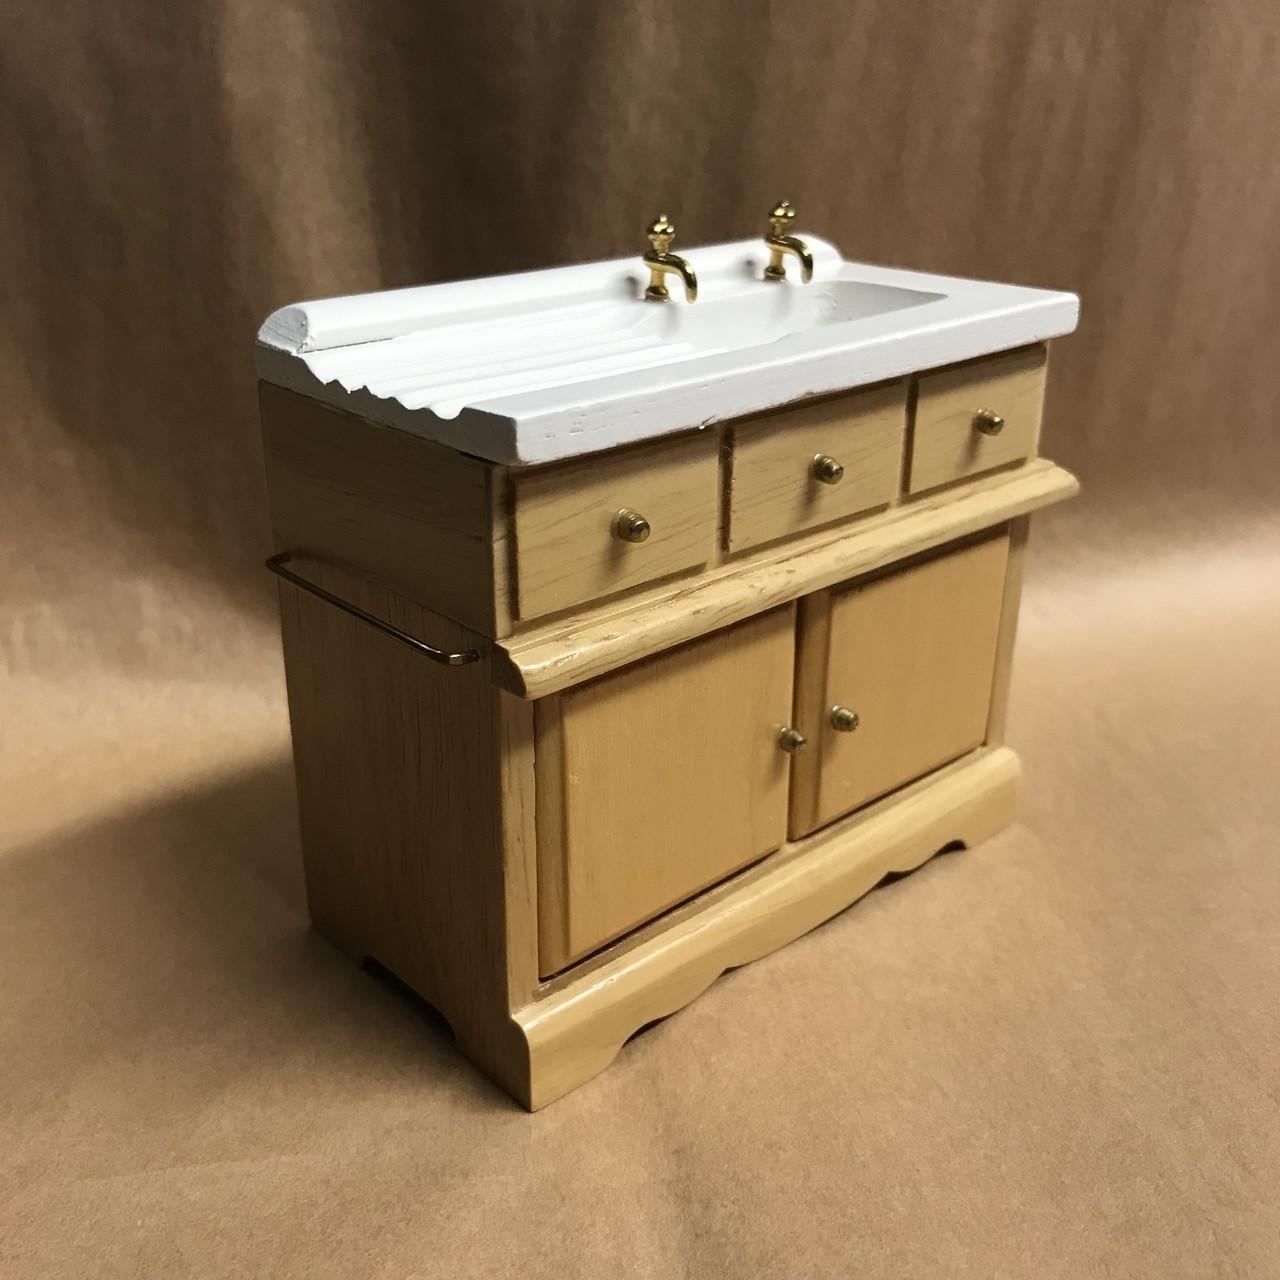 AZD0144A - Country Kitchen Sink